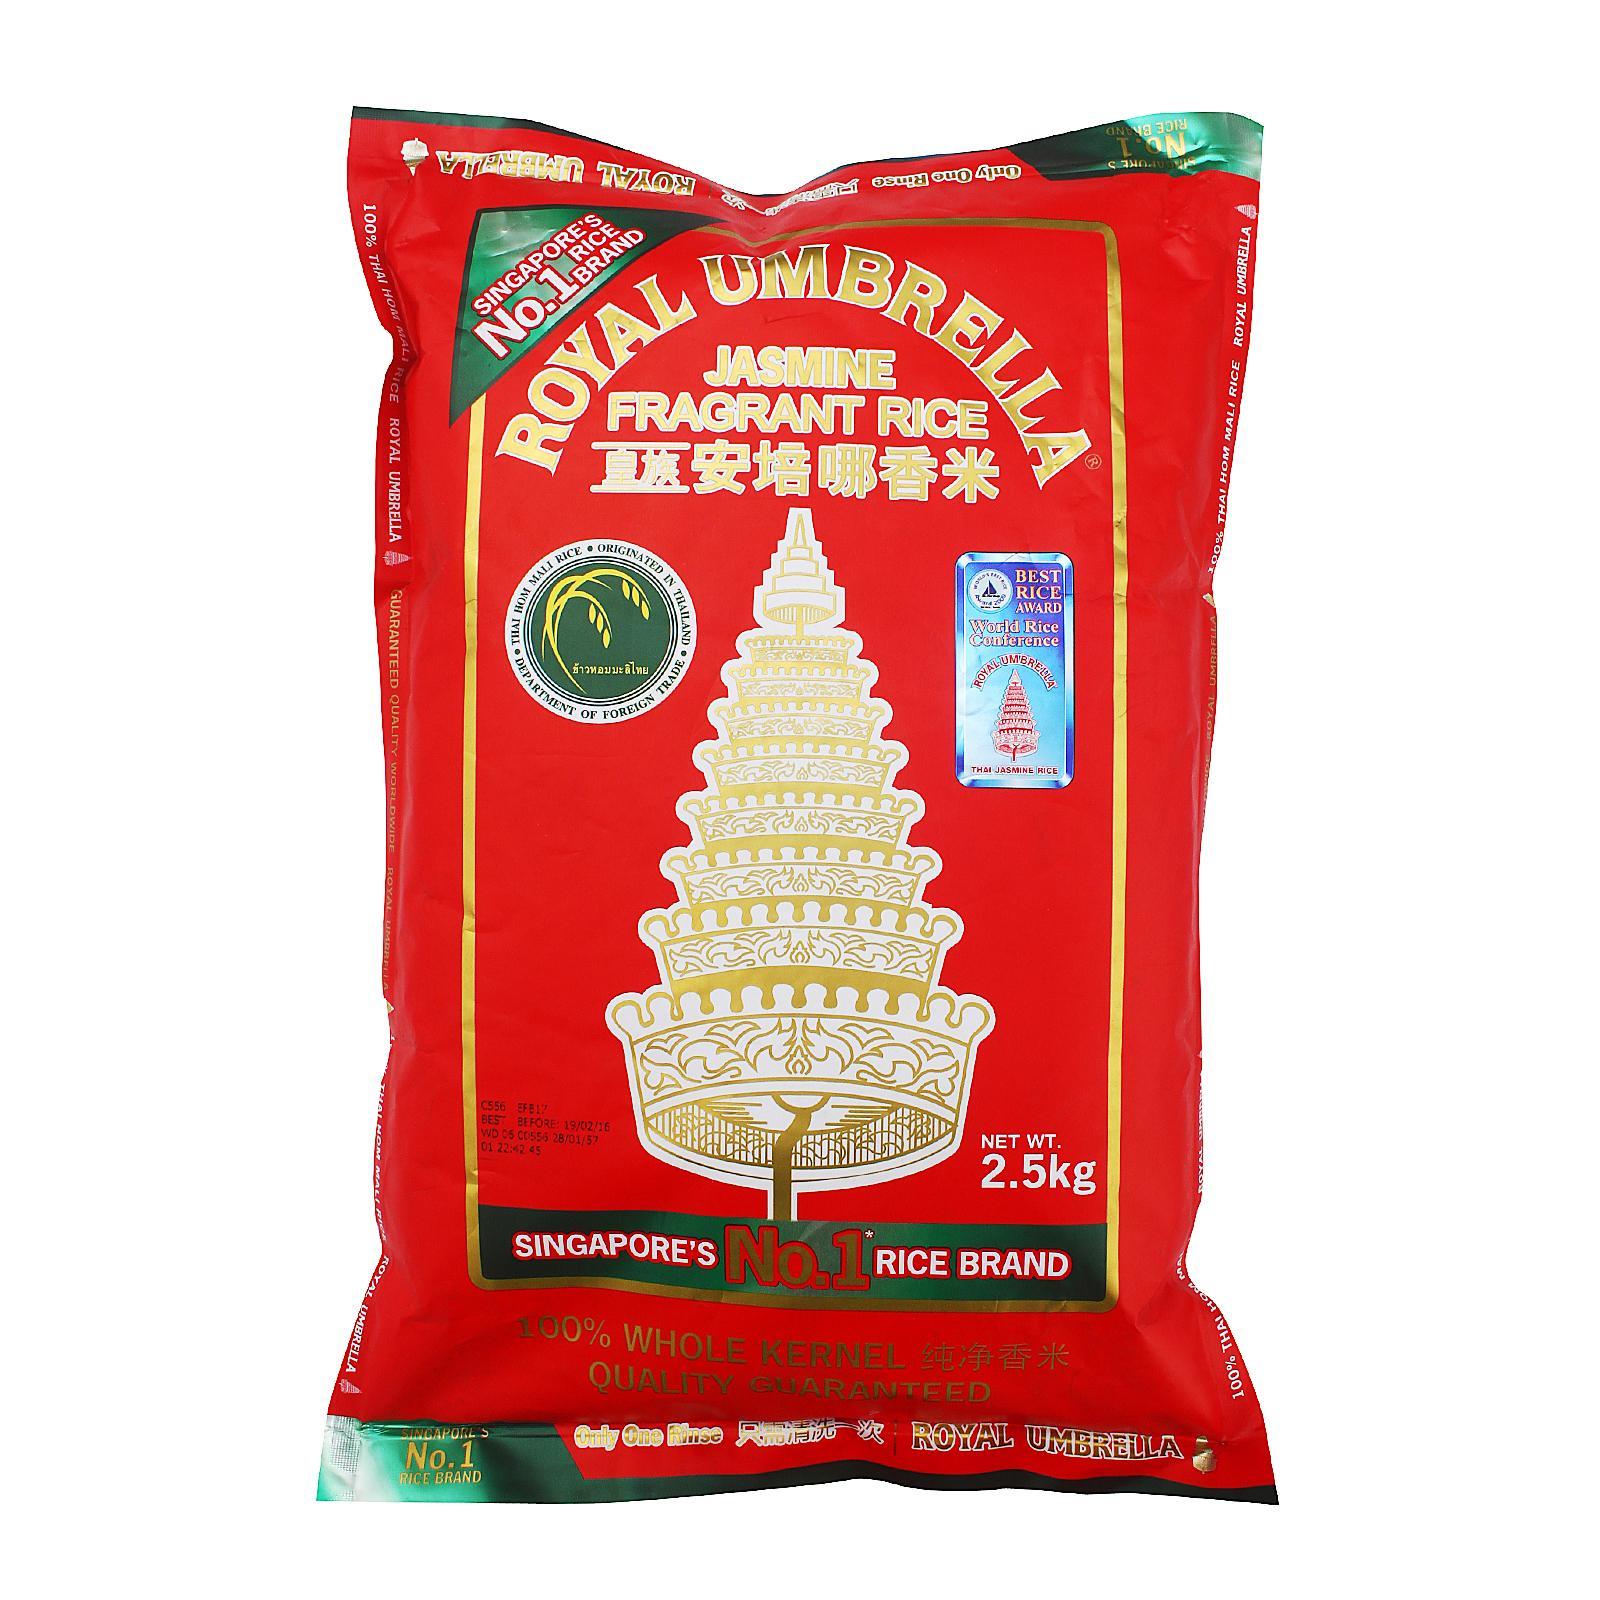 ROYAL UMBRELLA Thai Hom Mali Rice 2.5kg